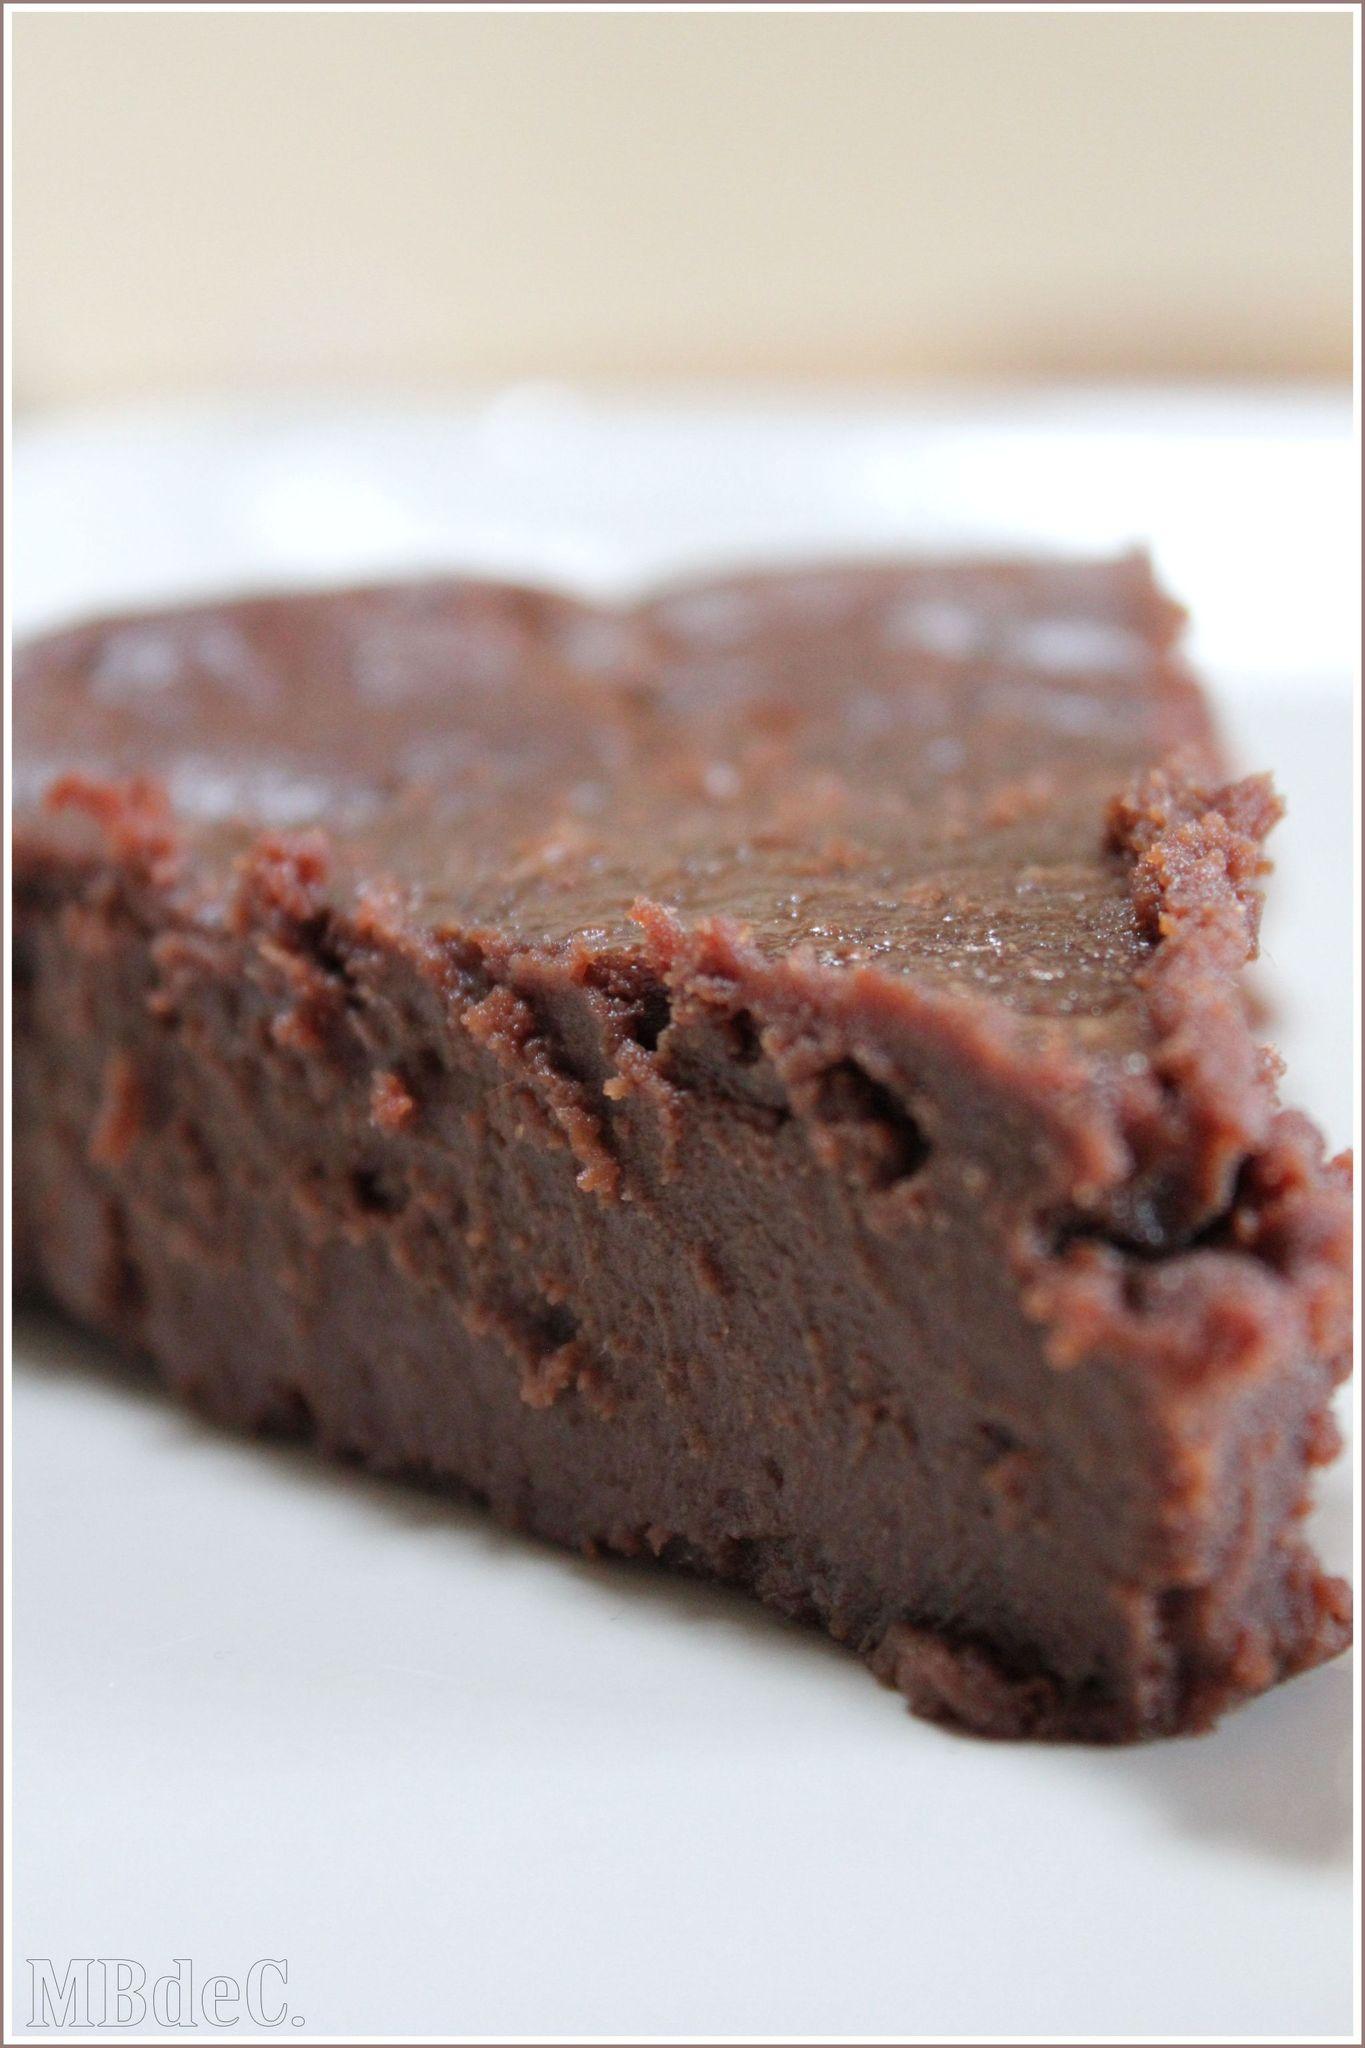 Marmiton Recette Gateau Au Chocolat Recette Gateau Au Chocolat